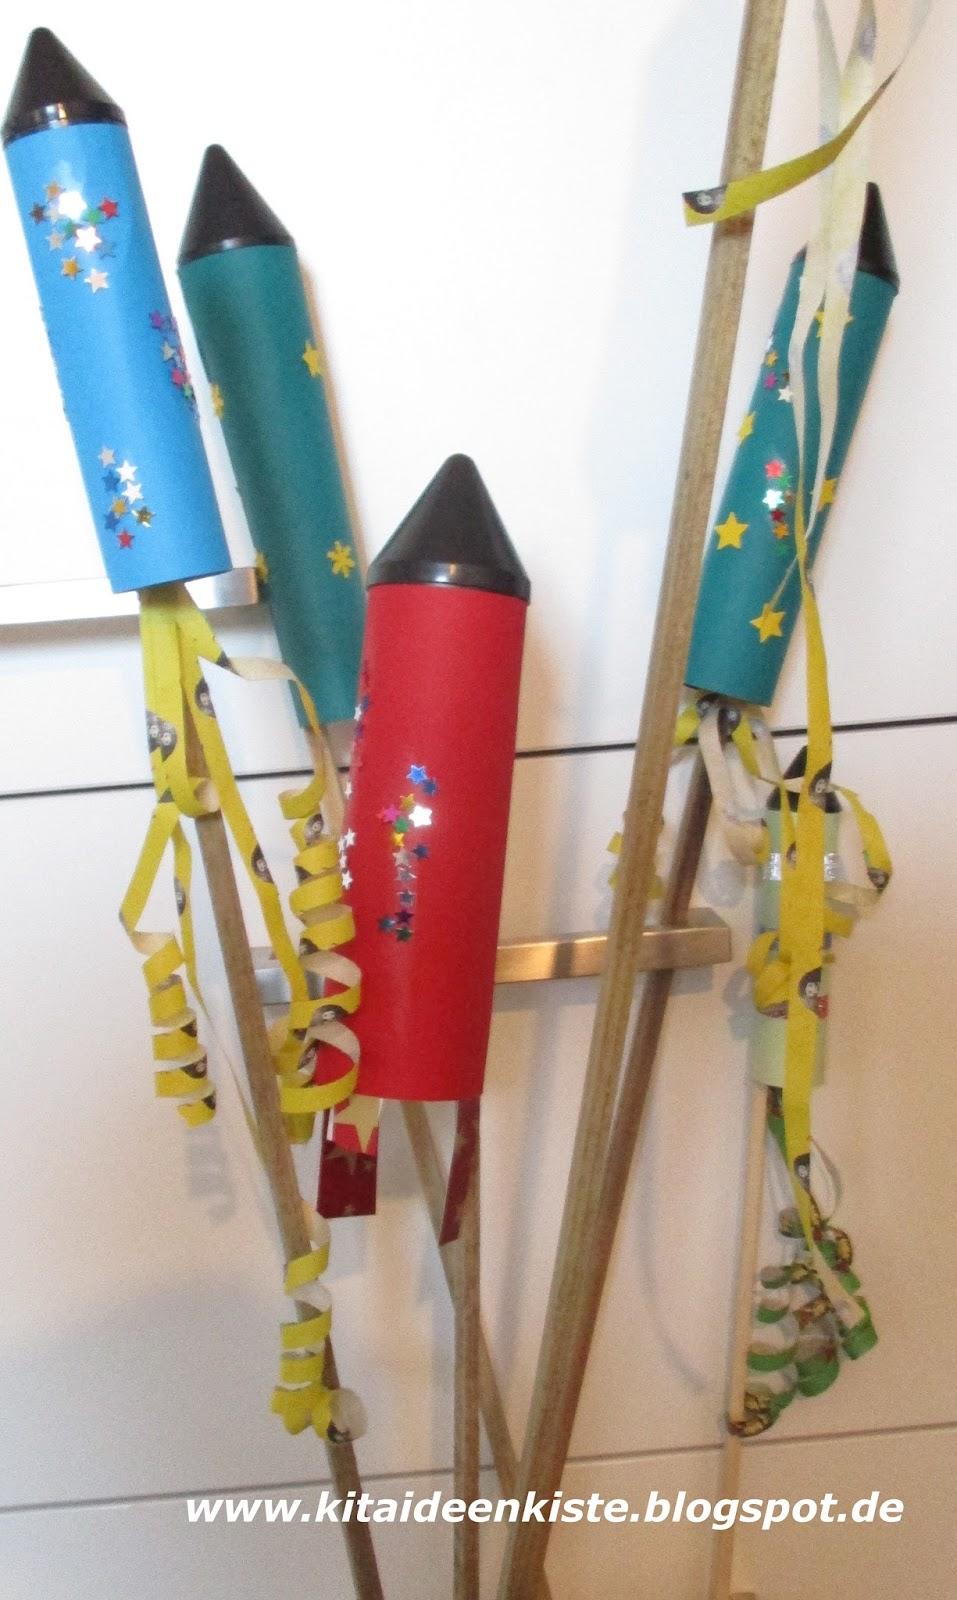 Kita Ideenkiste Nicht Nur Für Erzieherinnen Raketen Basteln